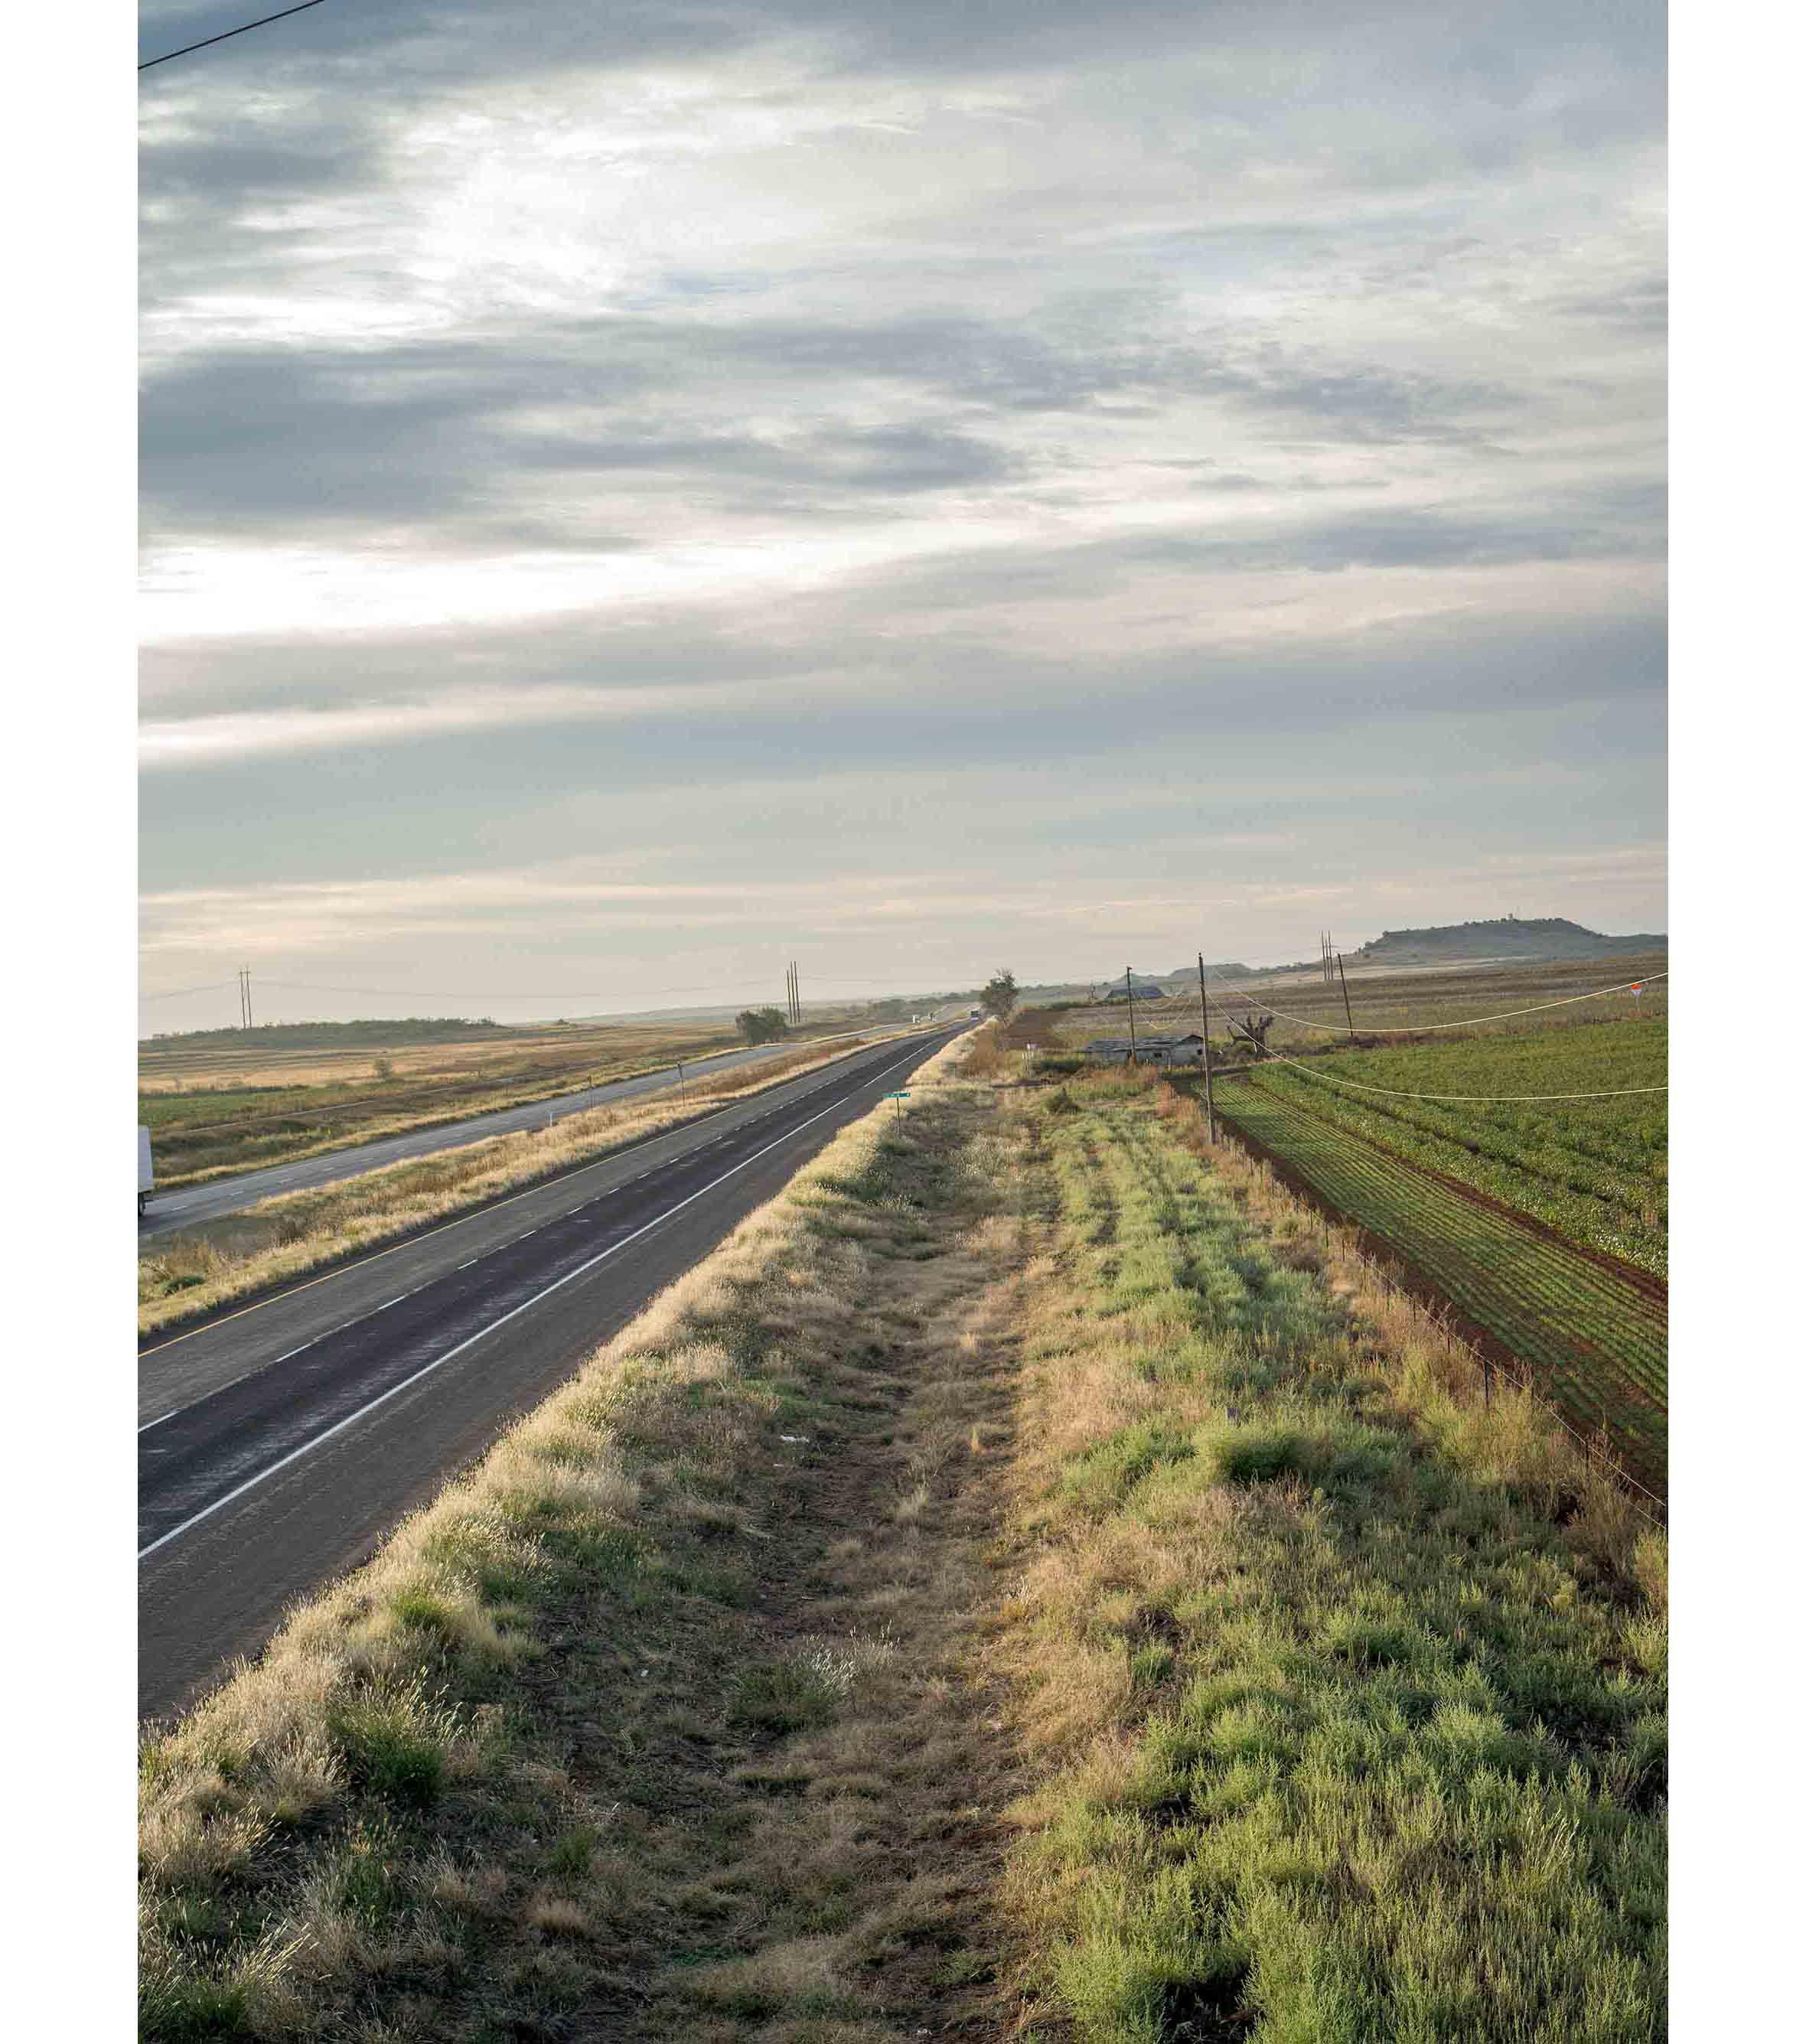 Cottonfields03.jpg